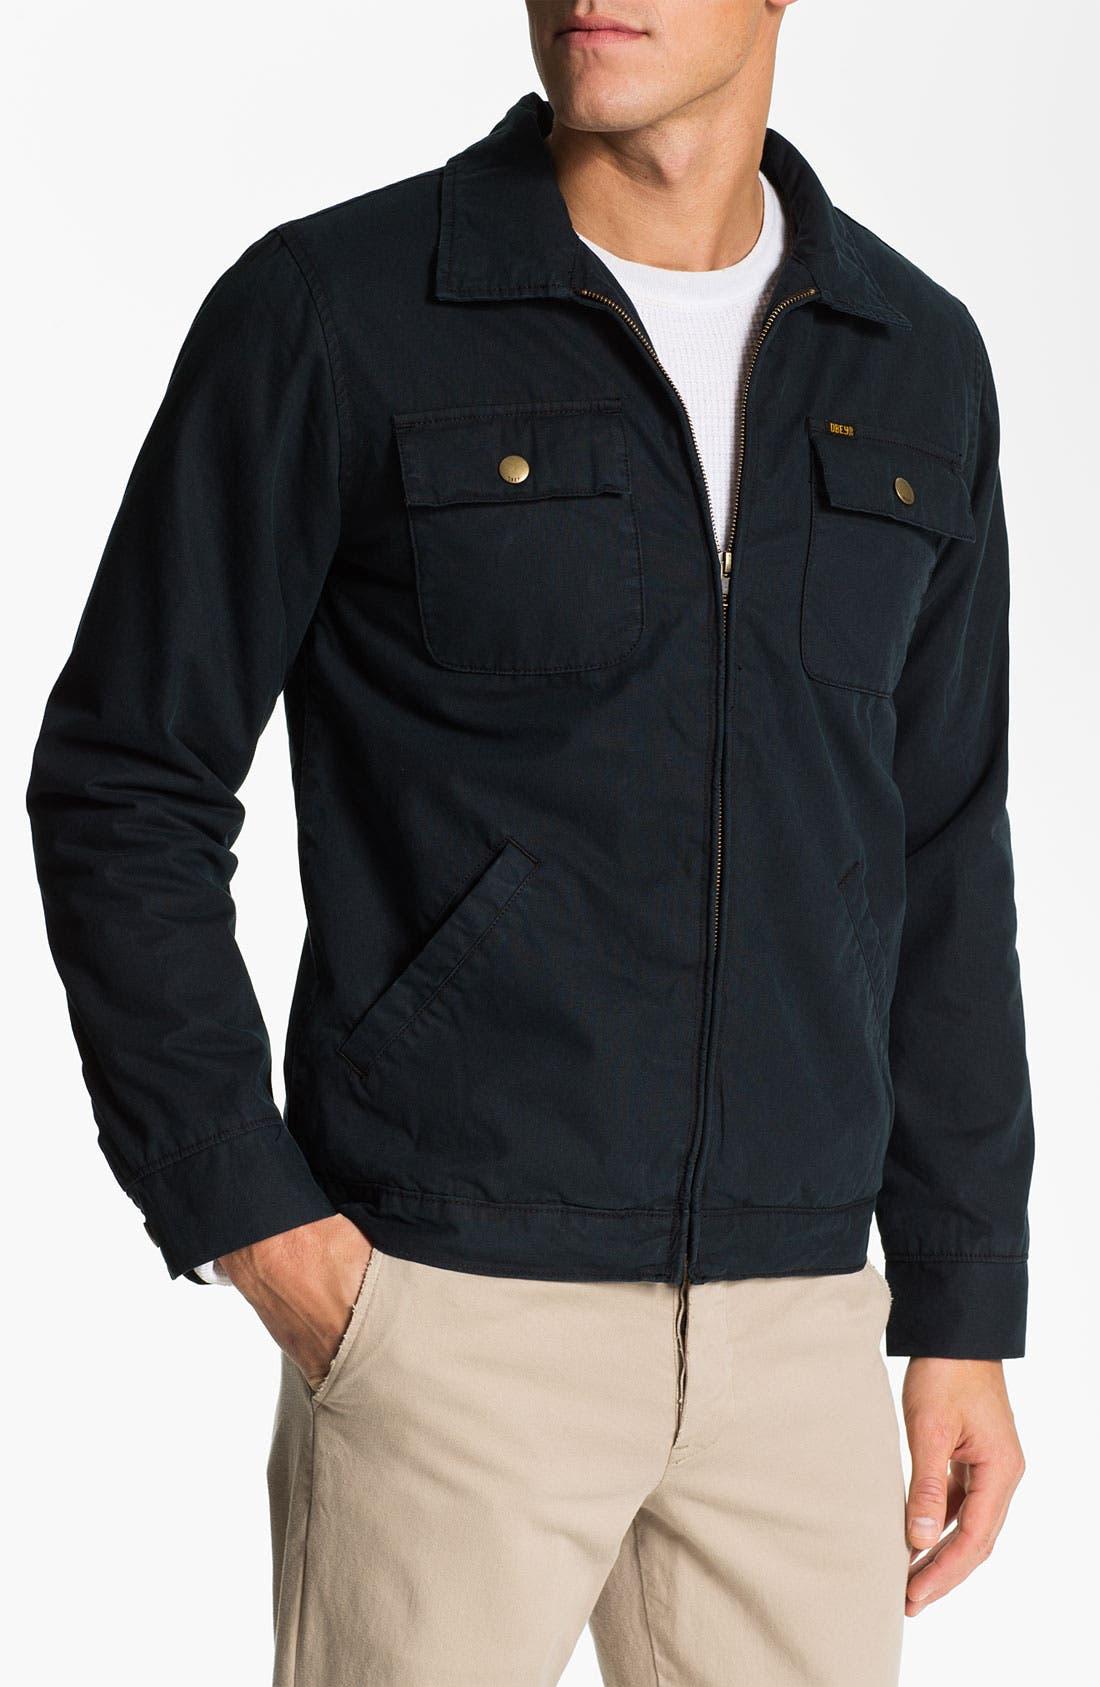 Alternate Image 1 Selected - Obey 'Marlow' Workwear Jacket